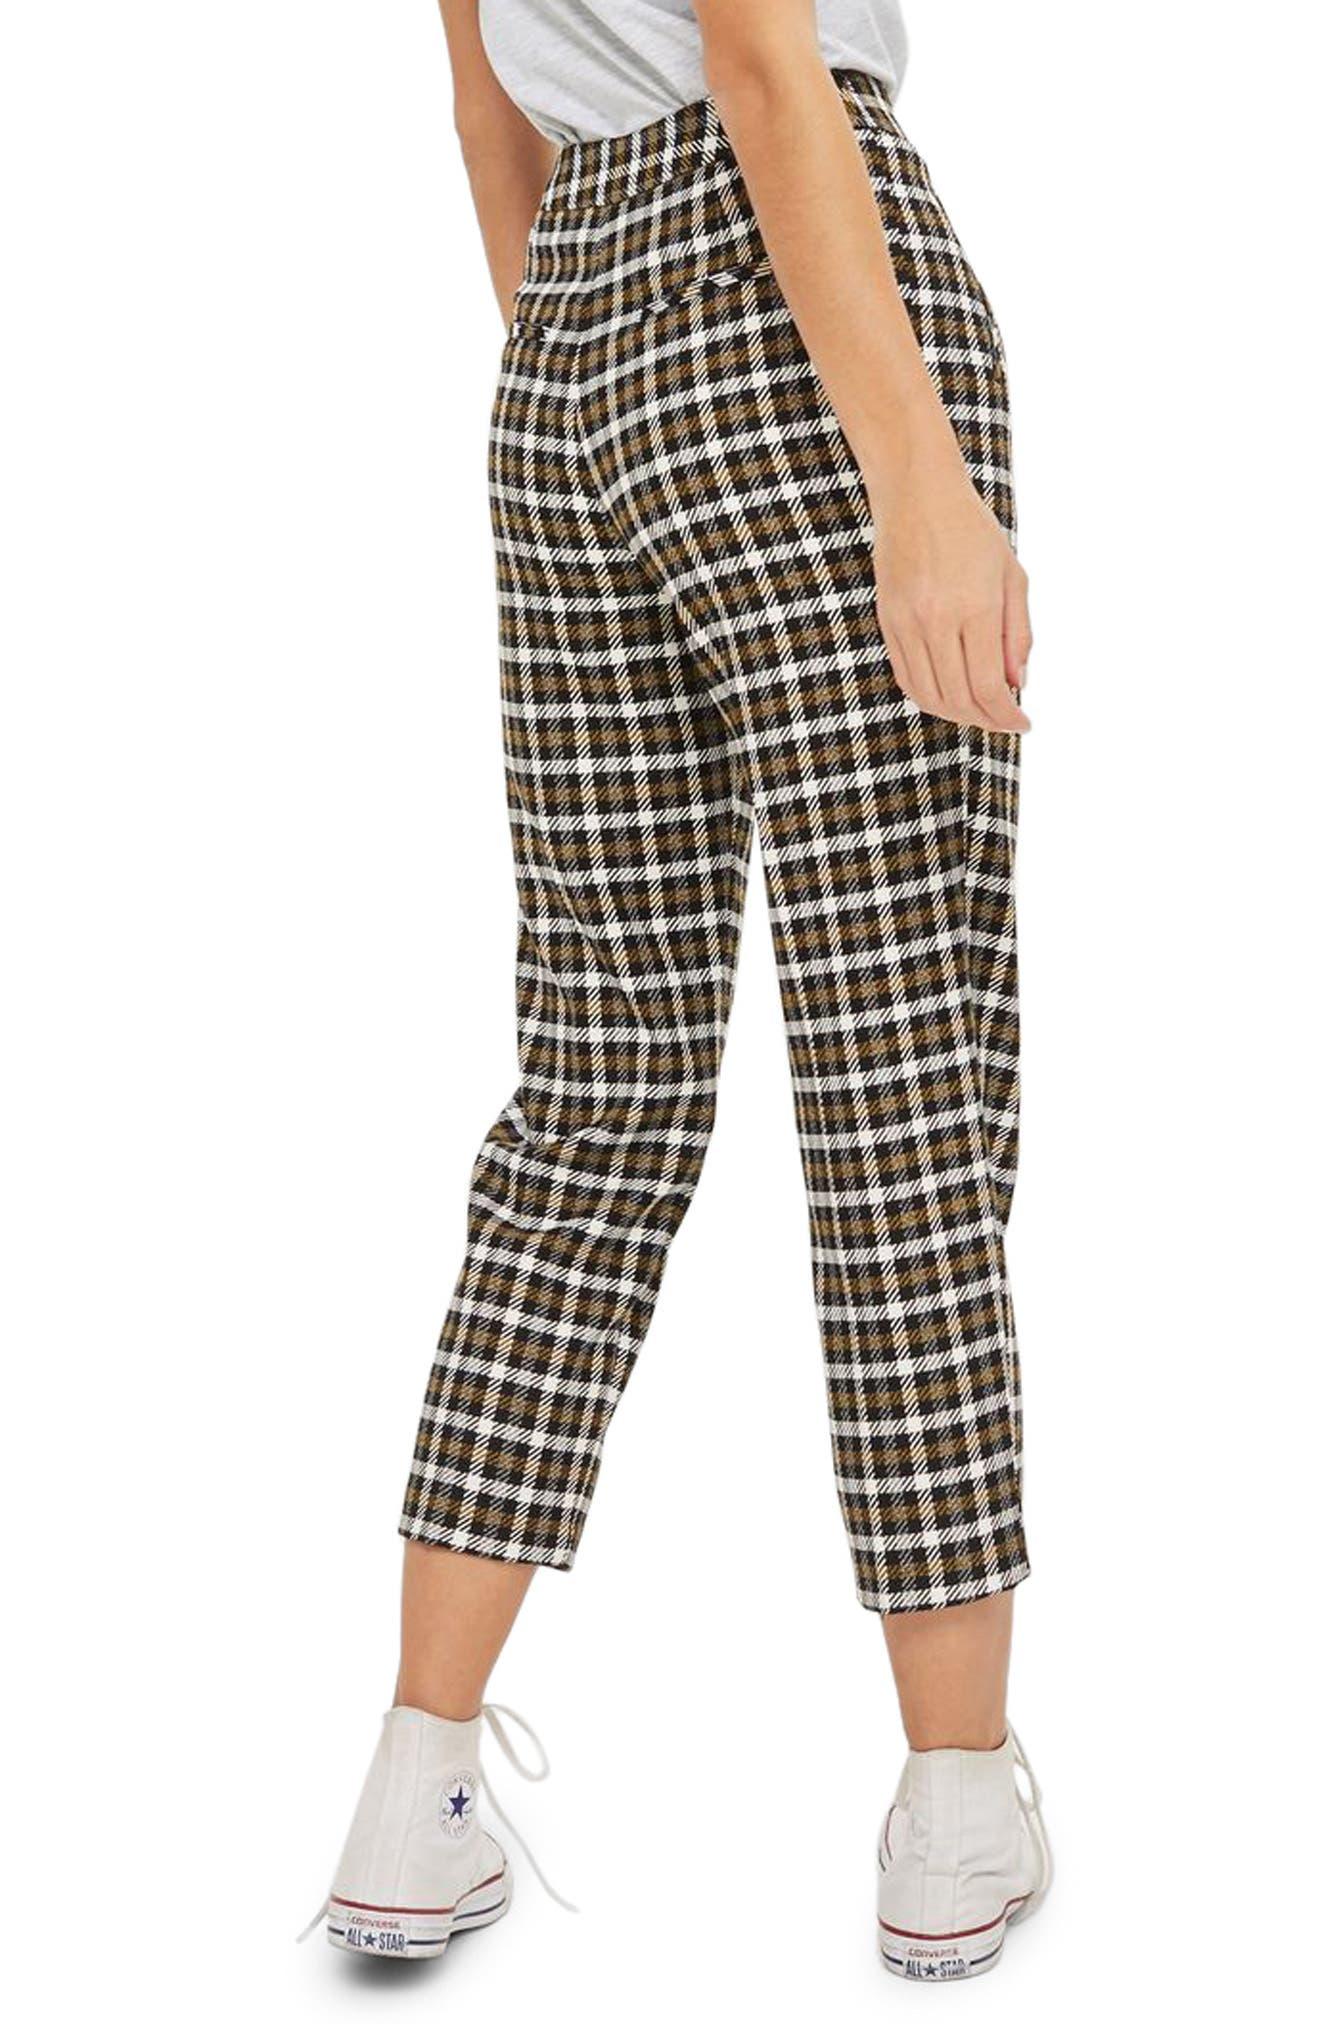 Monica Checked Peg Trousers,                             Alternate thumbnail 2, color,                             001